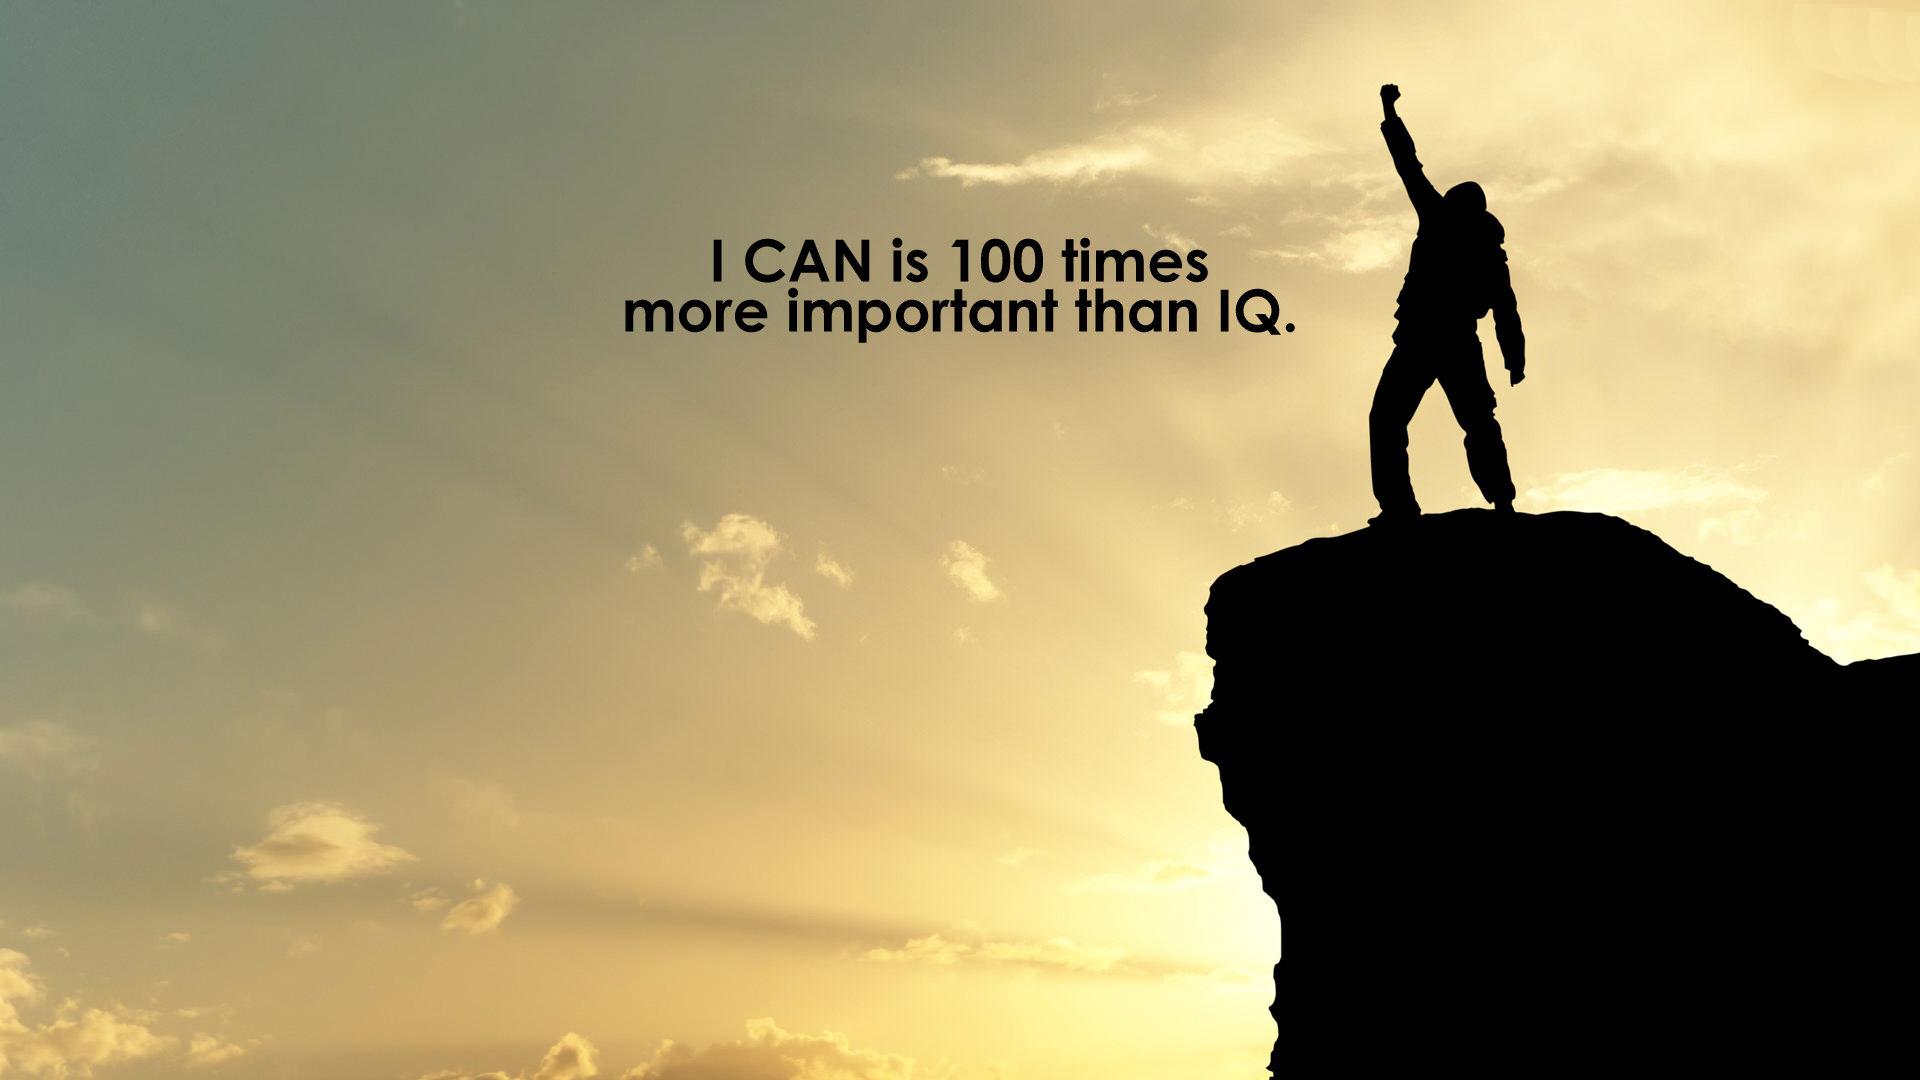 motivational quotes desktop wallpaper hd